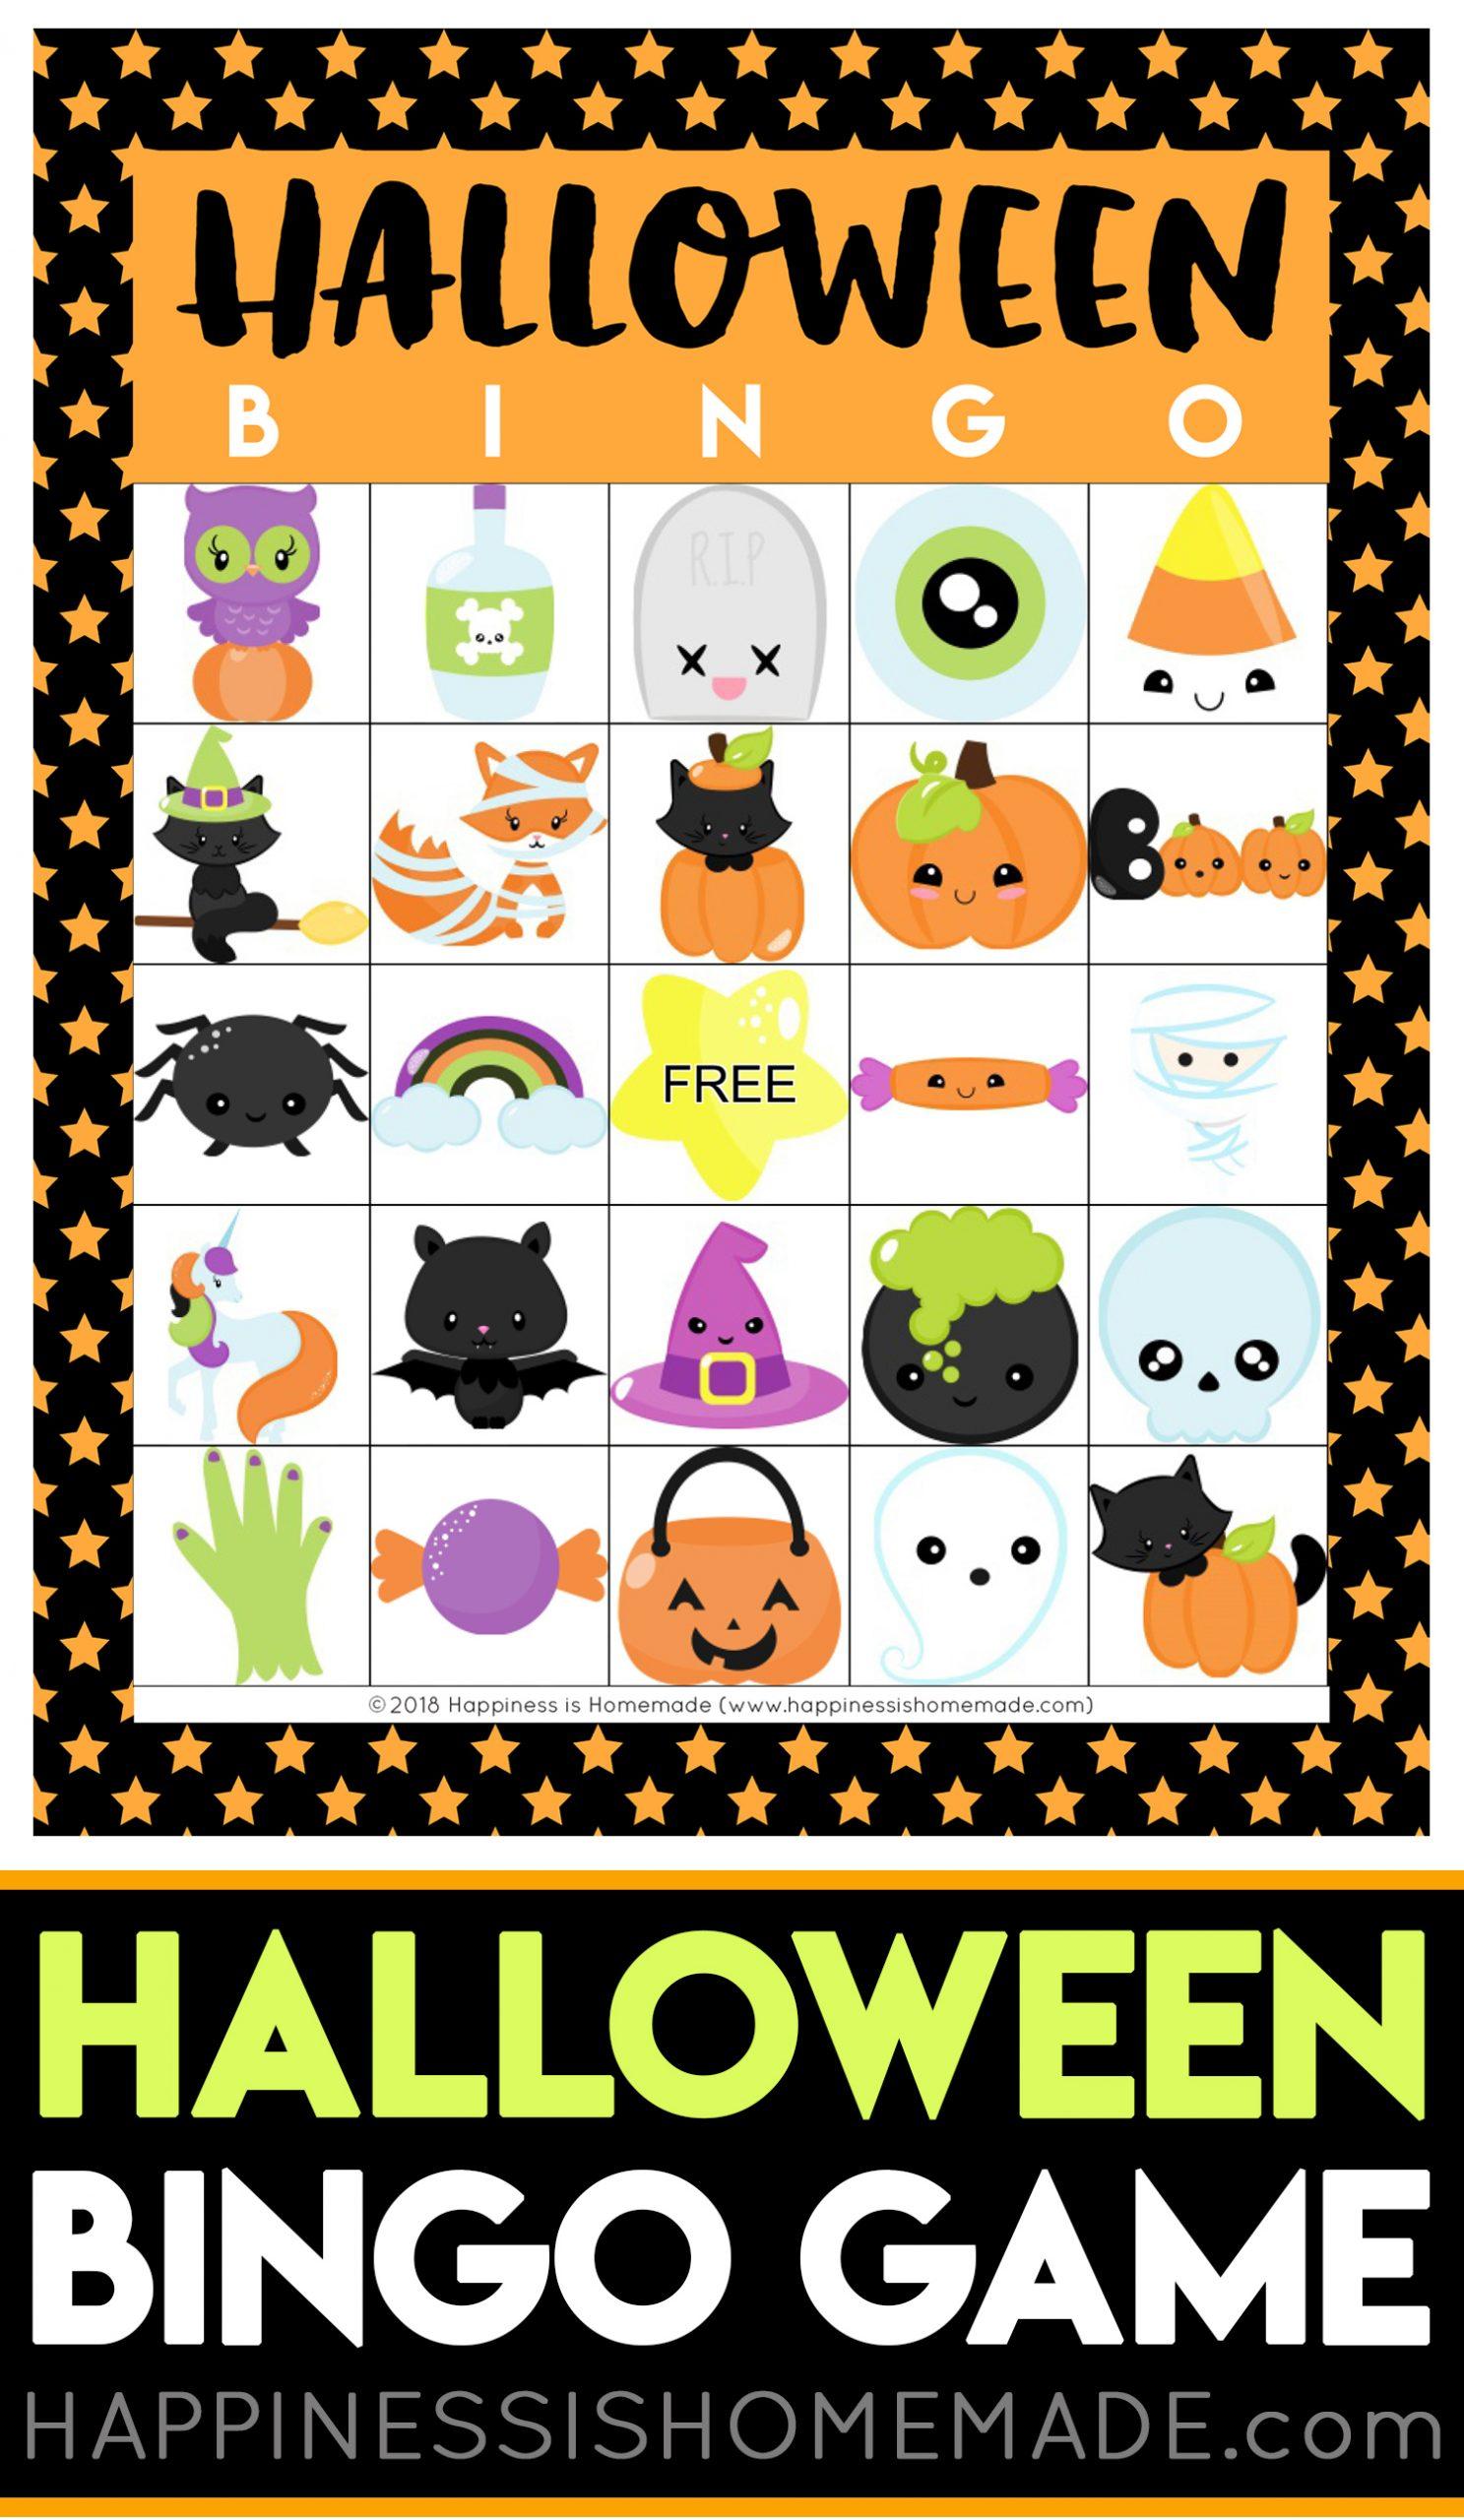 Printable Halloween Bingo Game Cards - Happiness Is Homemade